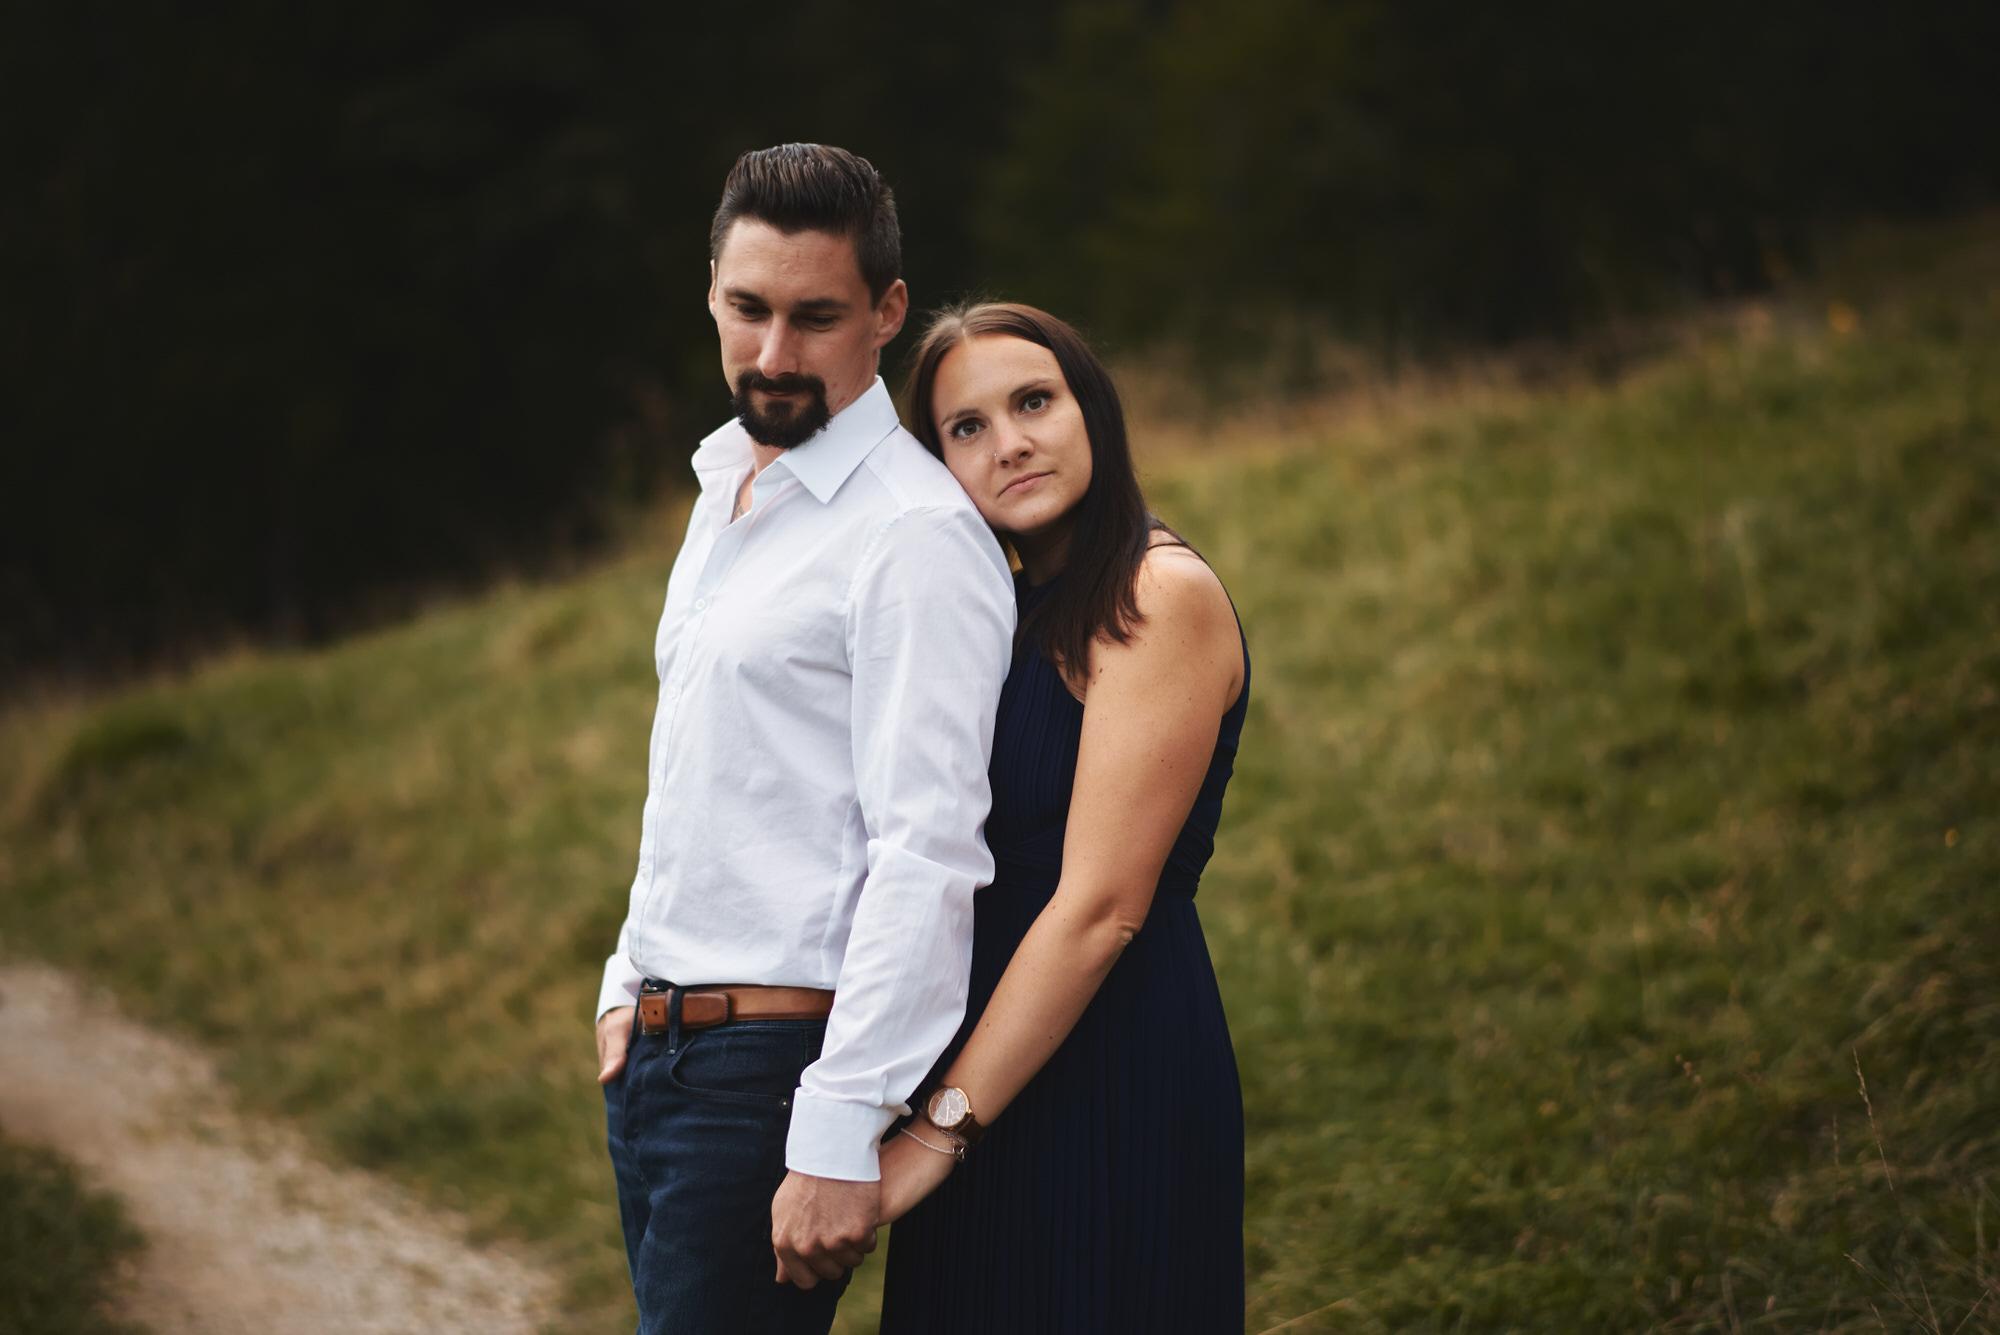 Fotograf Allgaeu Oberstdorf Hochzeitsfotograf Martin Spoerl Photography 0008